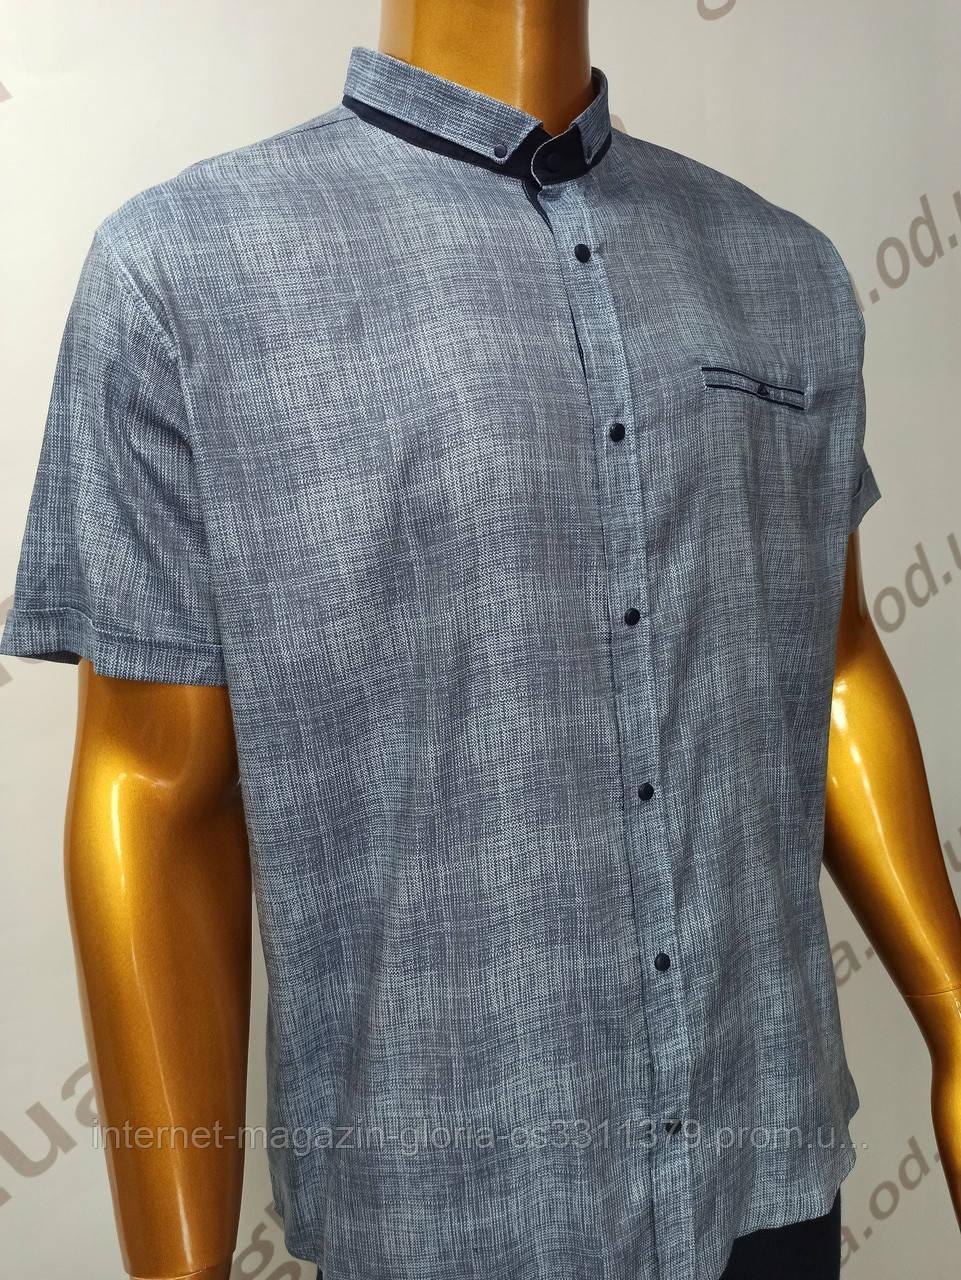 Мужская рубашка Amato. AG  29744(g).Батал. Размеры: 2XL,3XL,4XL,5XL.